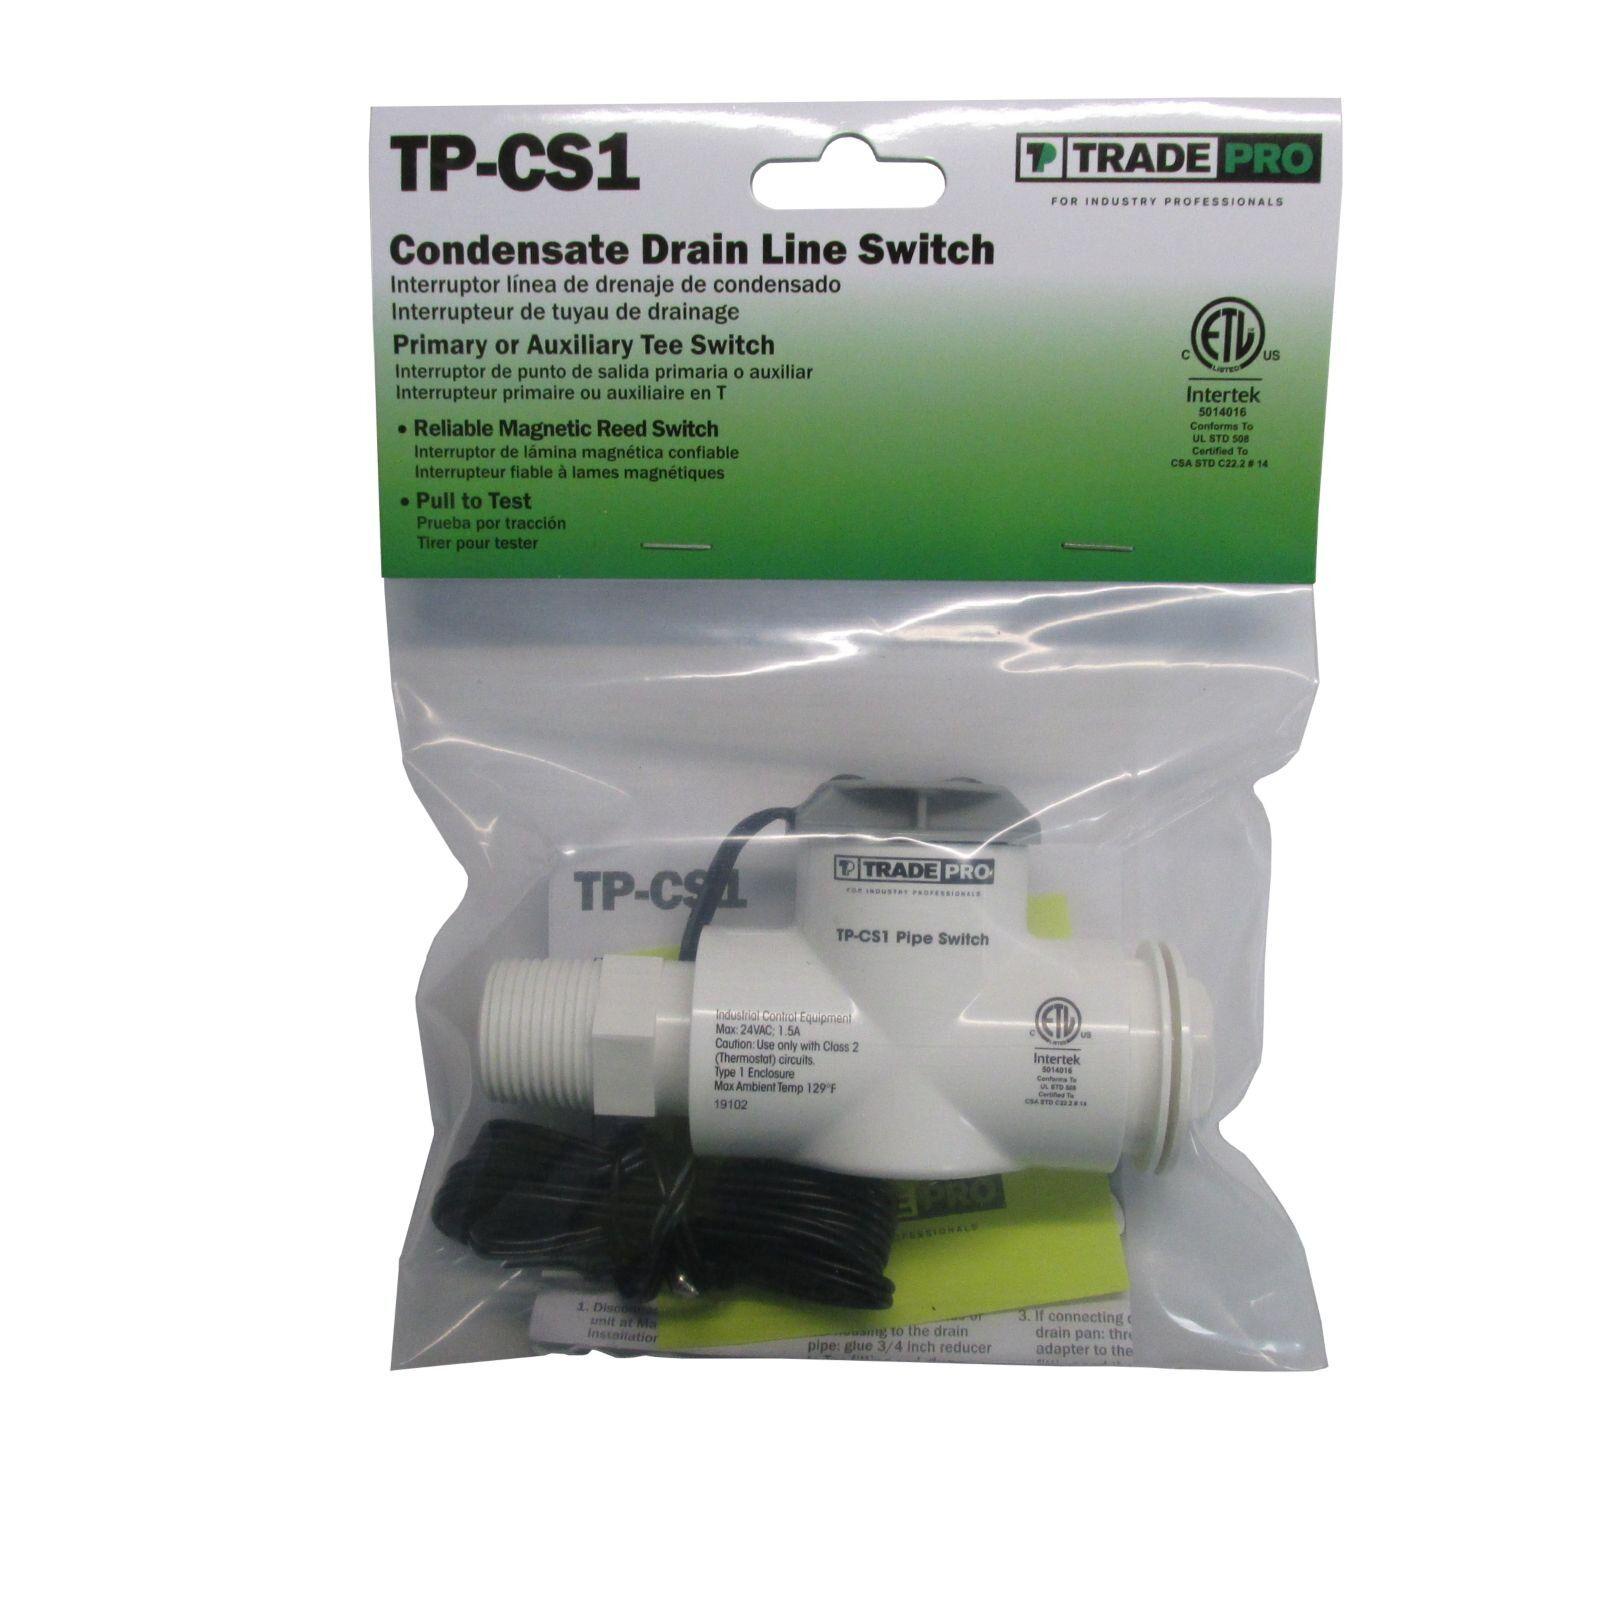 TRADEPRO® TPCS1 Condensate Drain Line Switch (Primary